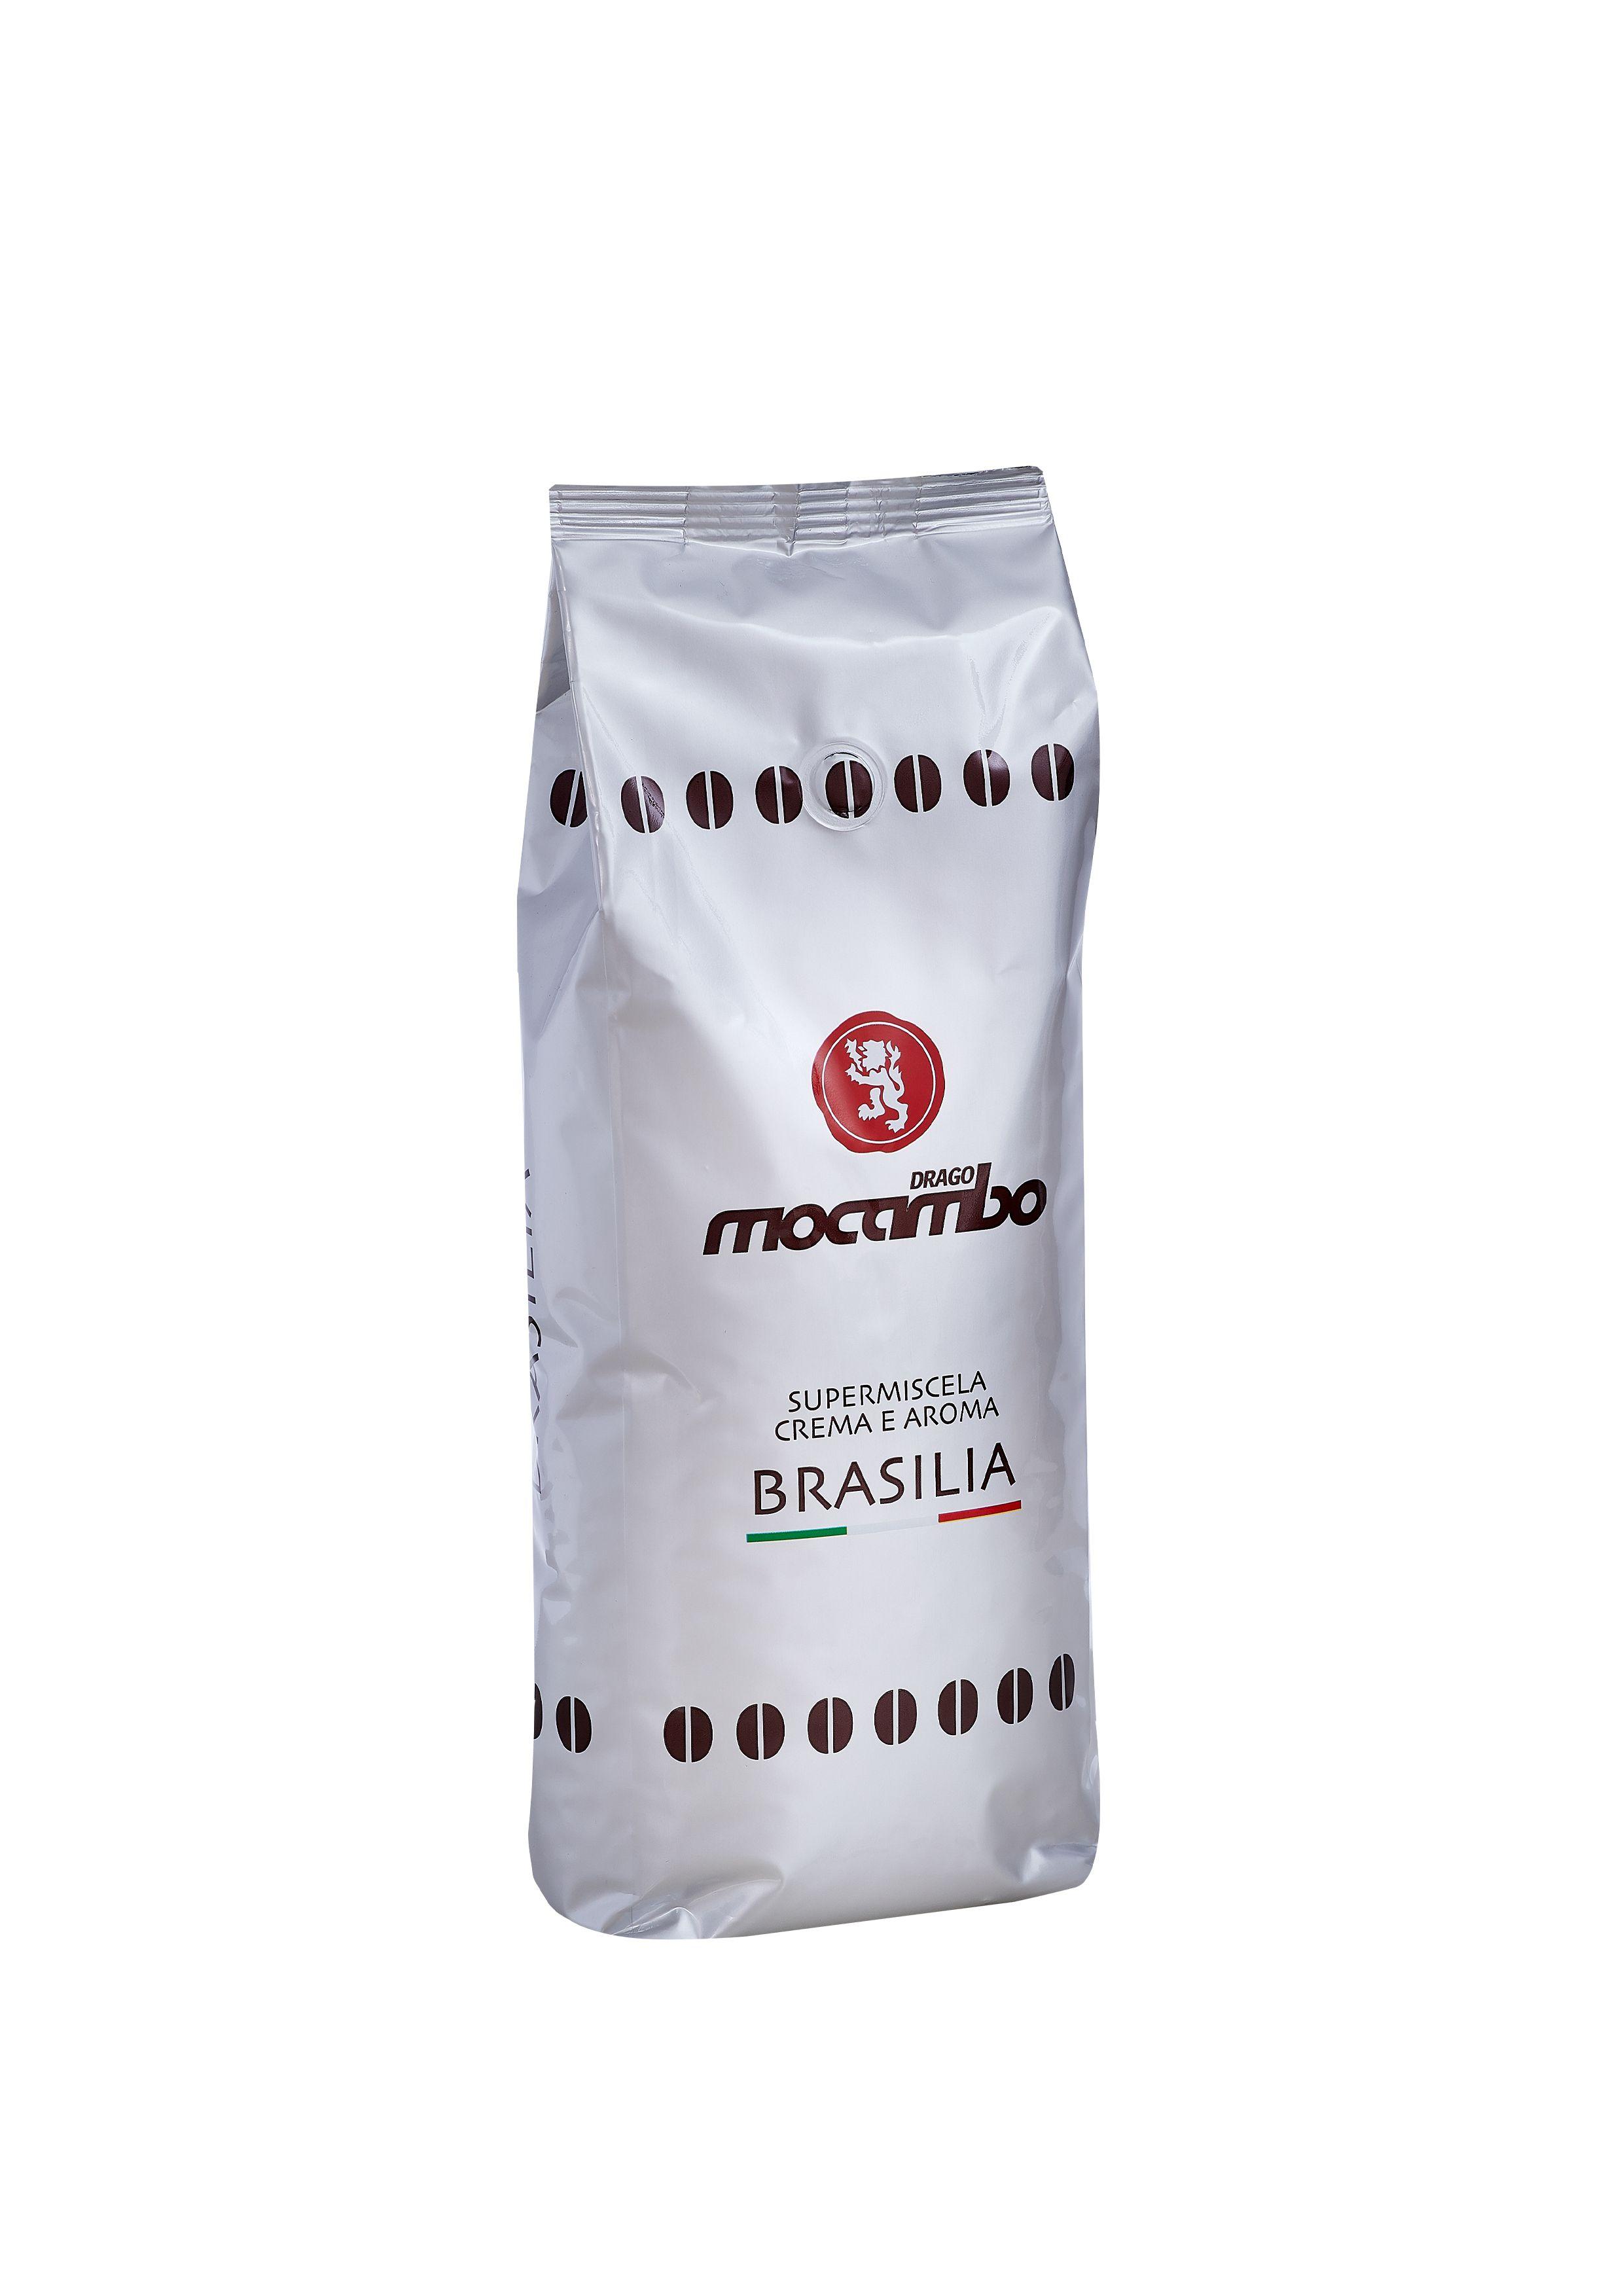 Mocambo Brasilia, Espresso Kaffee Bohnen 1 kg